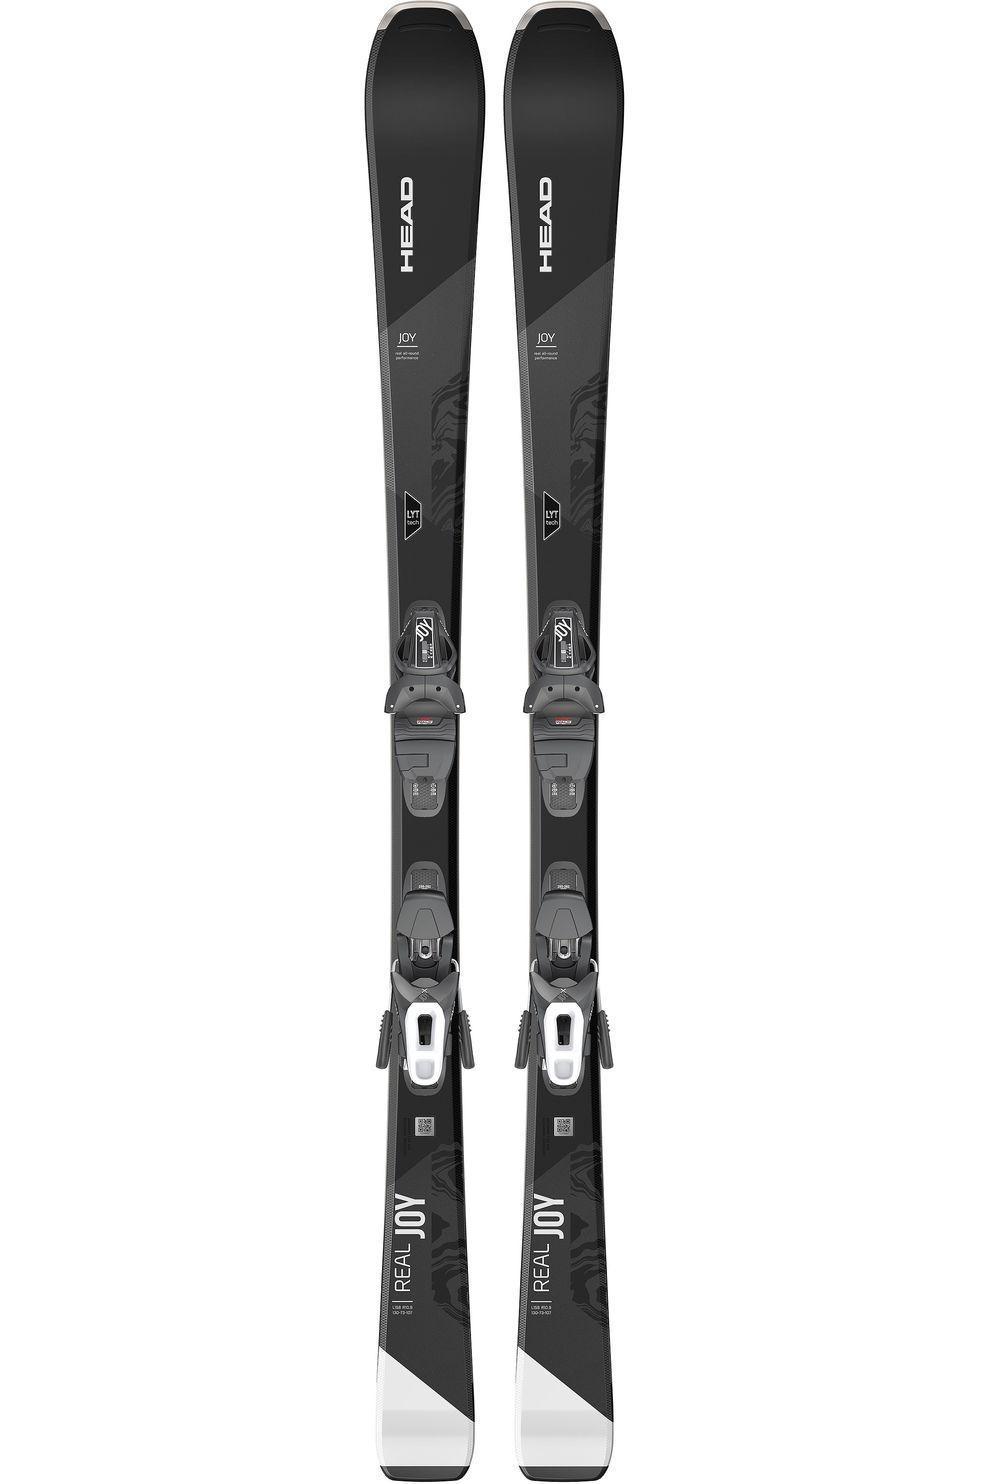 Head Ski Real Joy+ Joy 9 Gw - Zwart/Wit - Maten: 148, 153, 158